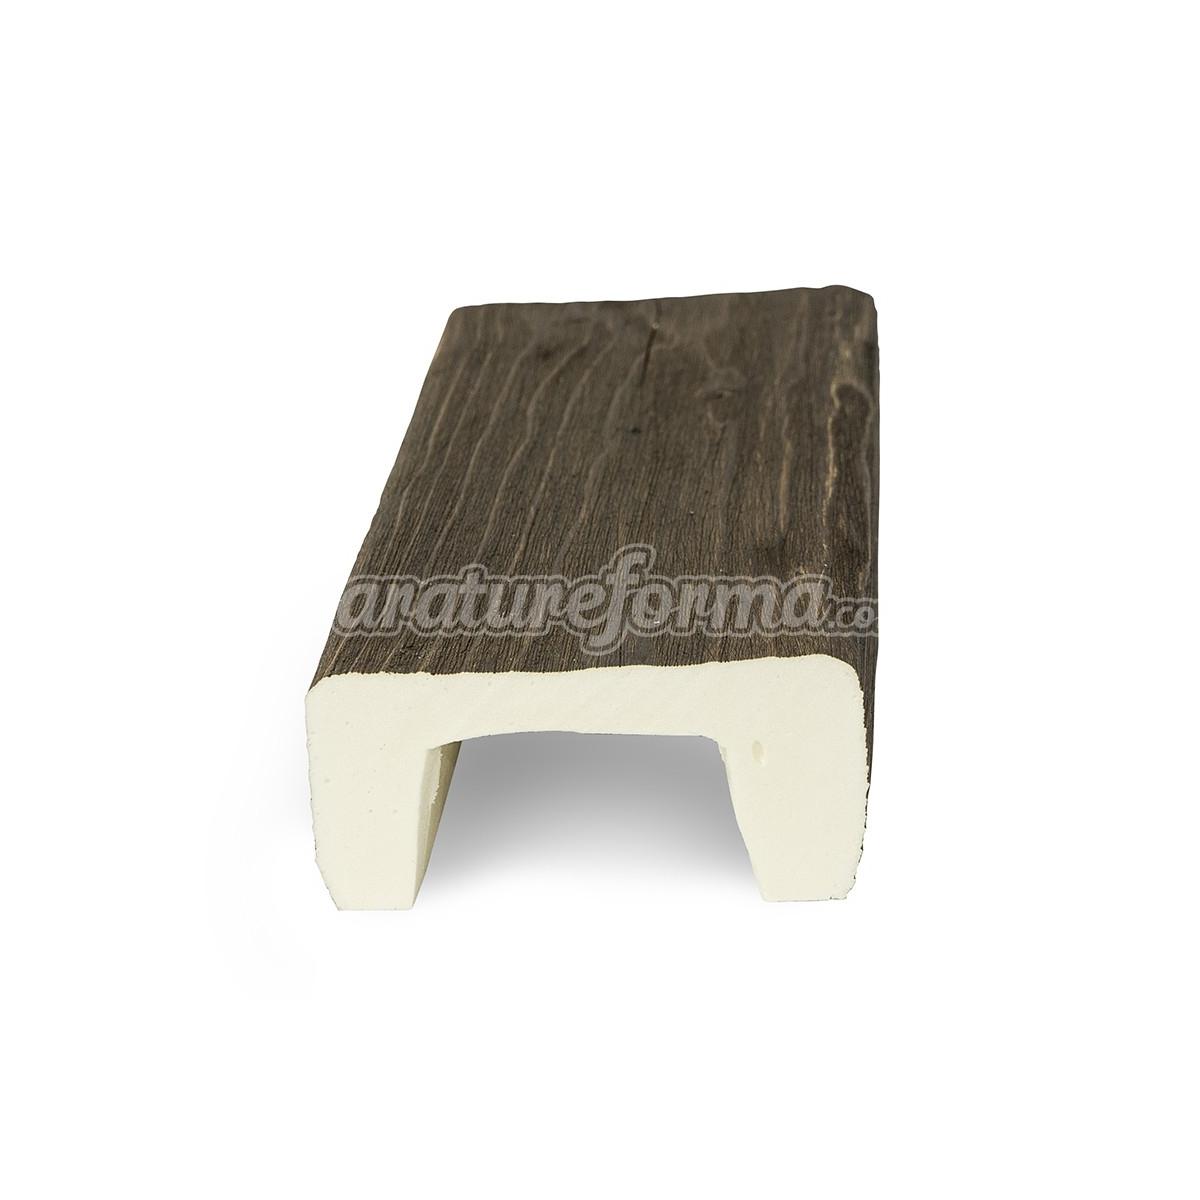 Grupo Unamacor Viga 300x10x5 imitación madera